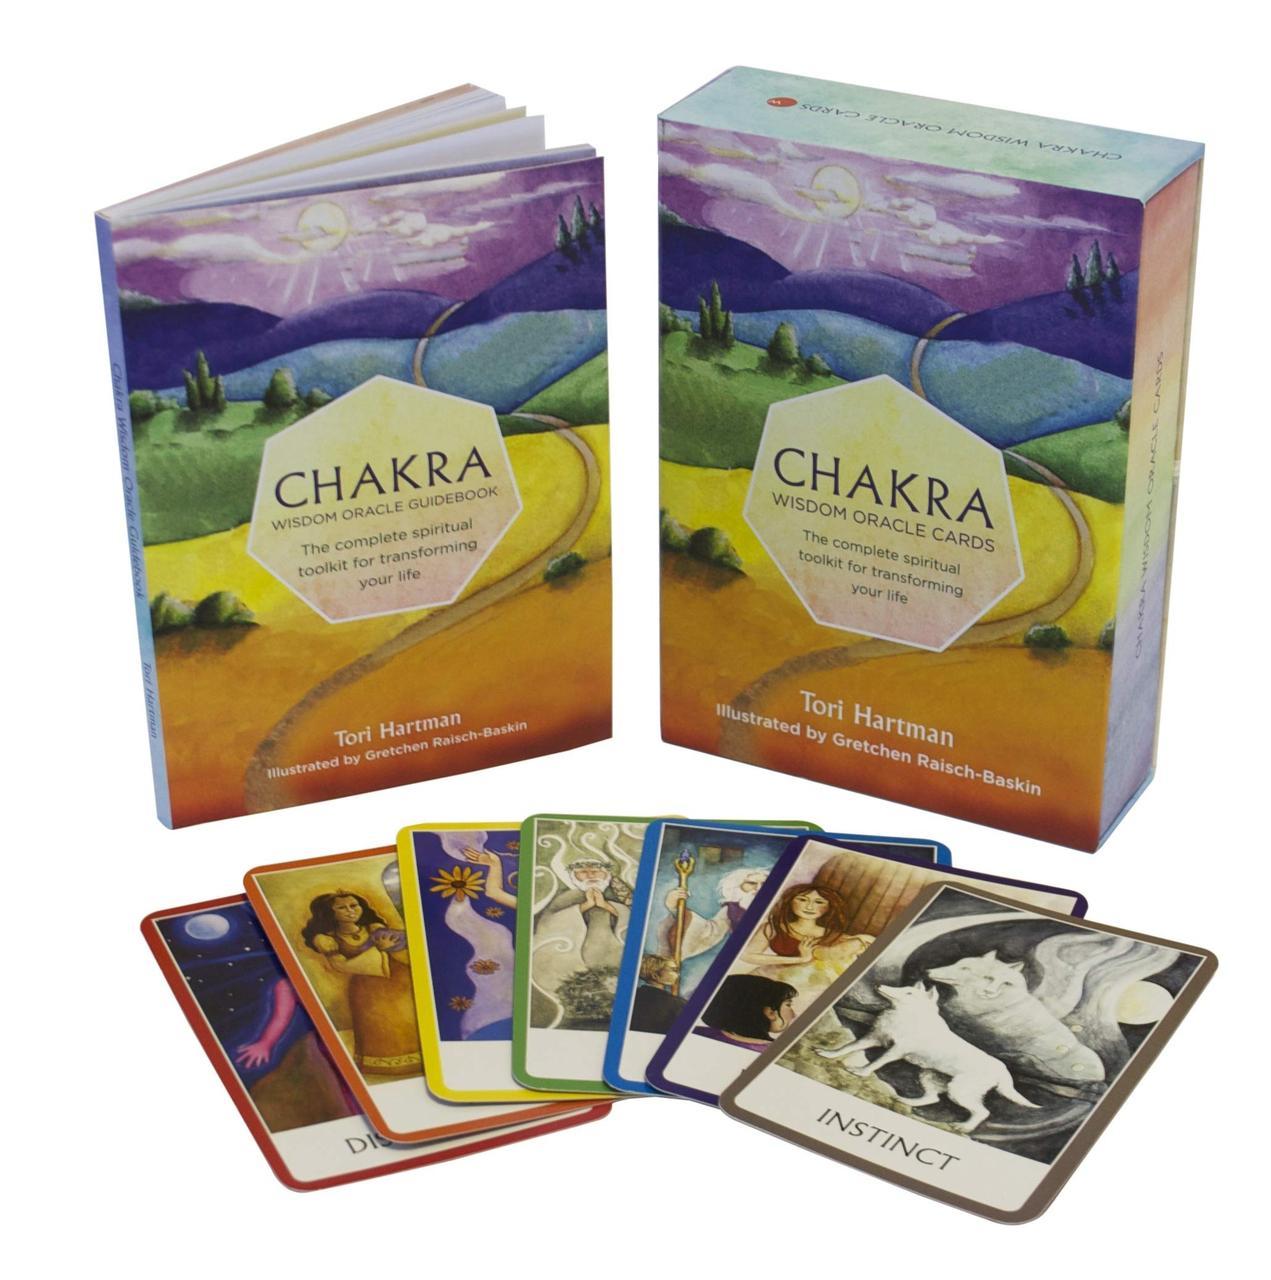 Chakra Wisdom Oracle Cards/ Карты-оракул. Чакры источник мудрости